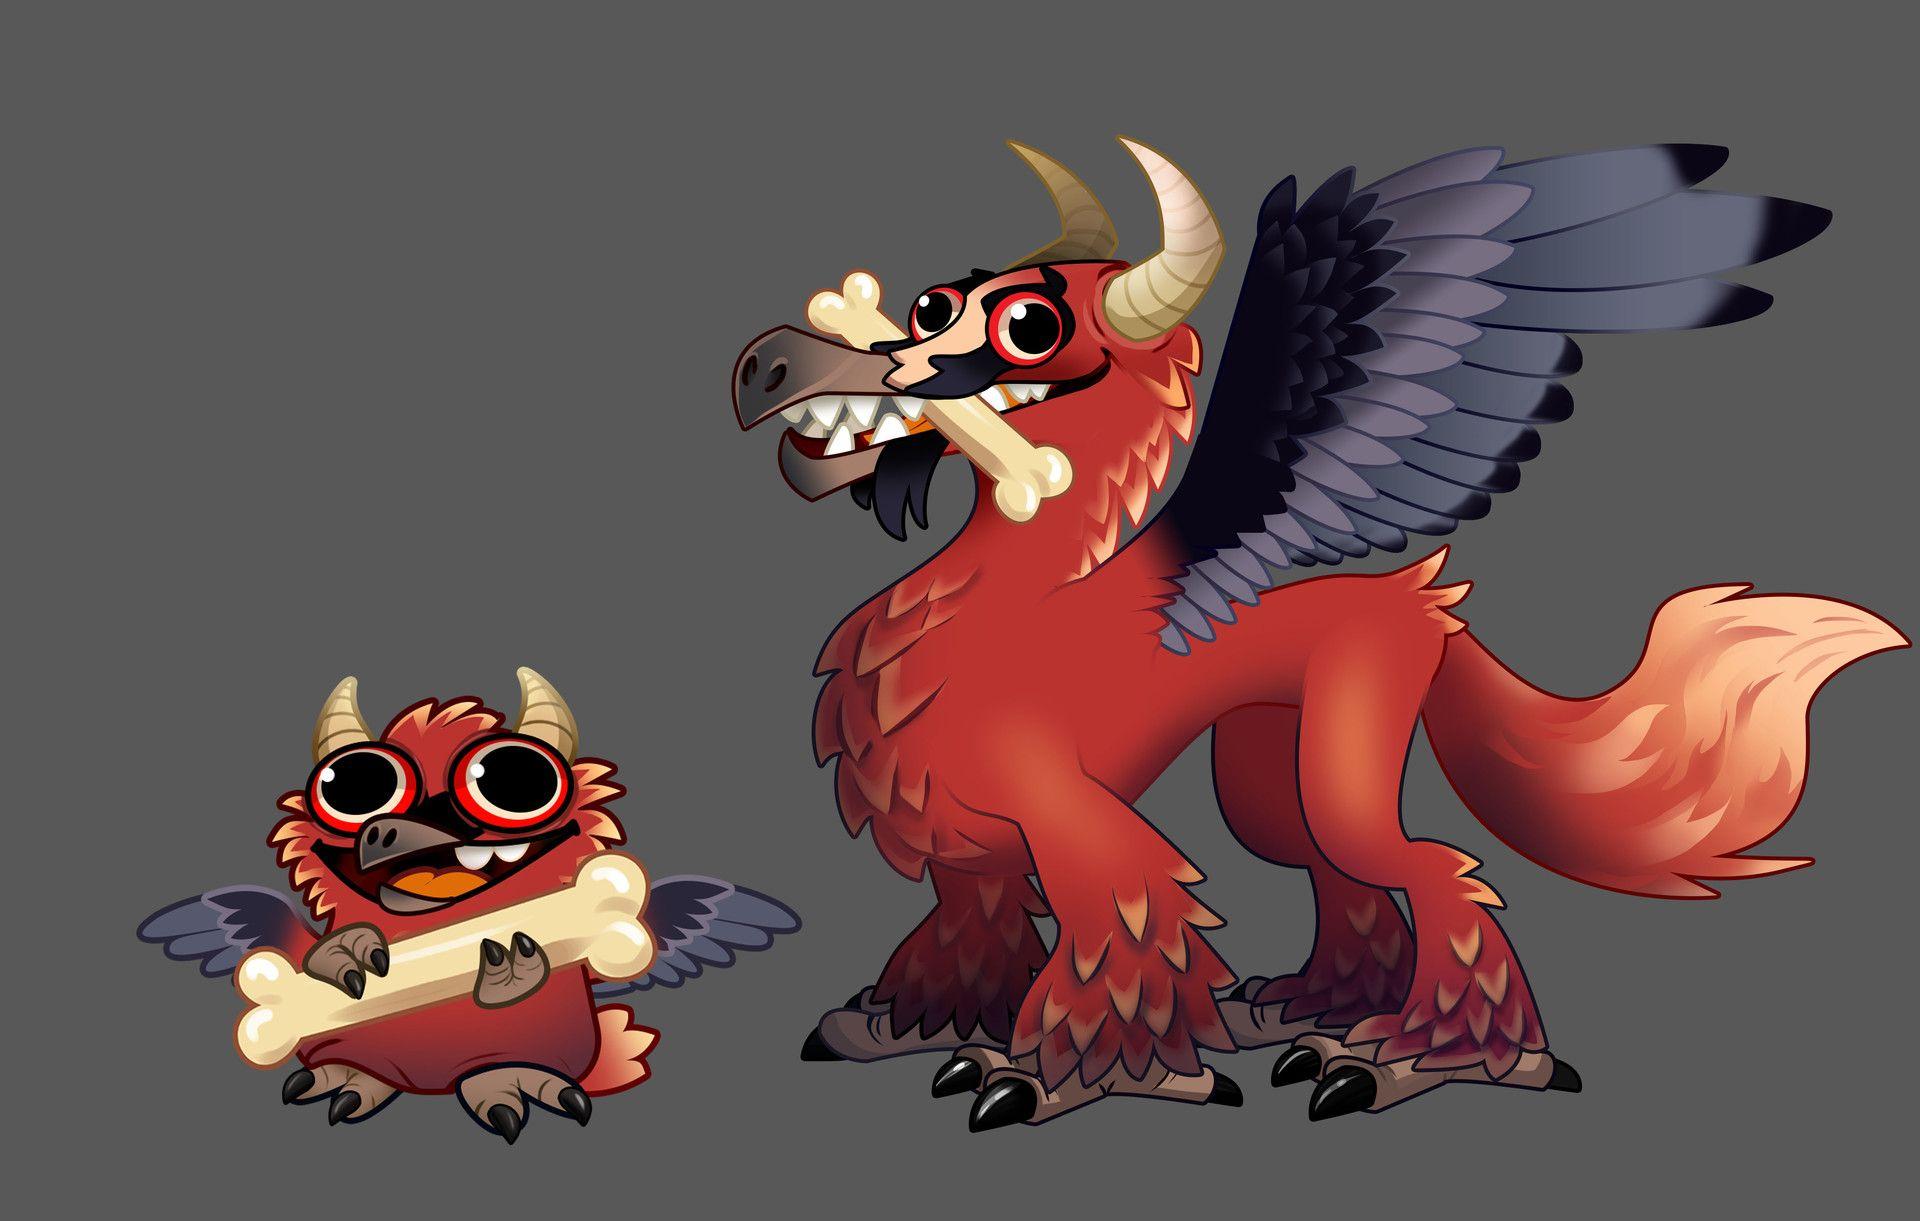 ArtStation Osteryx Dragon for Dragonvale, Meg Viola in